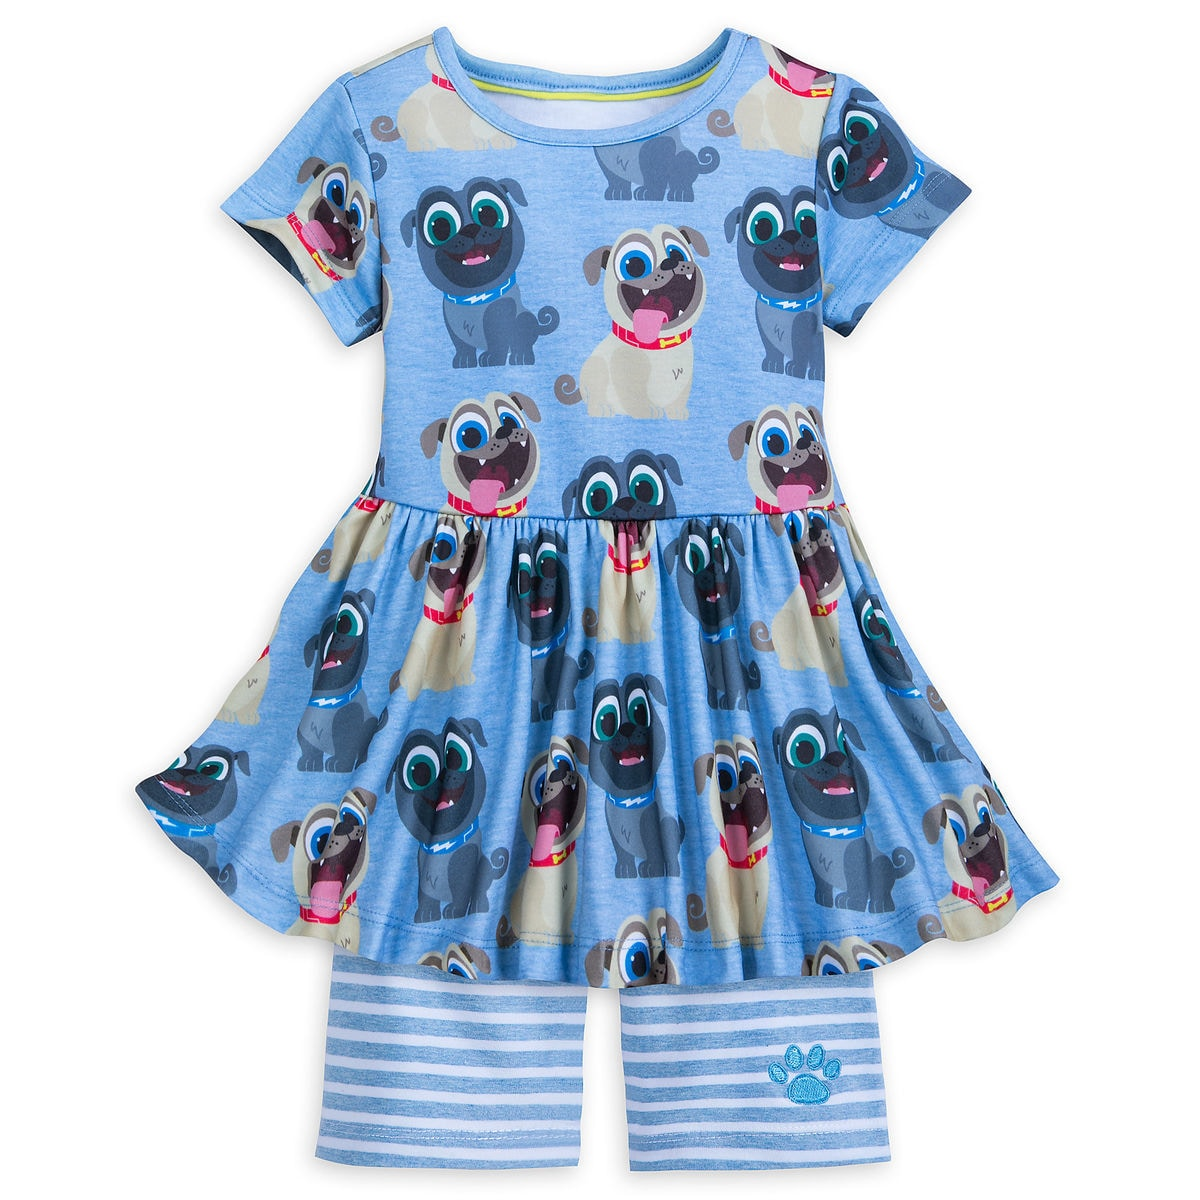 Puppy Dog Pals Dress Set for Girls | shopDisney